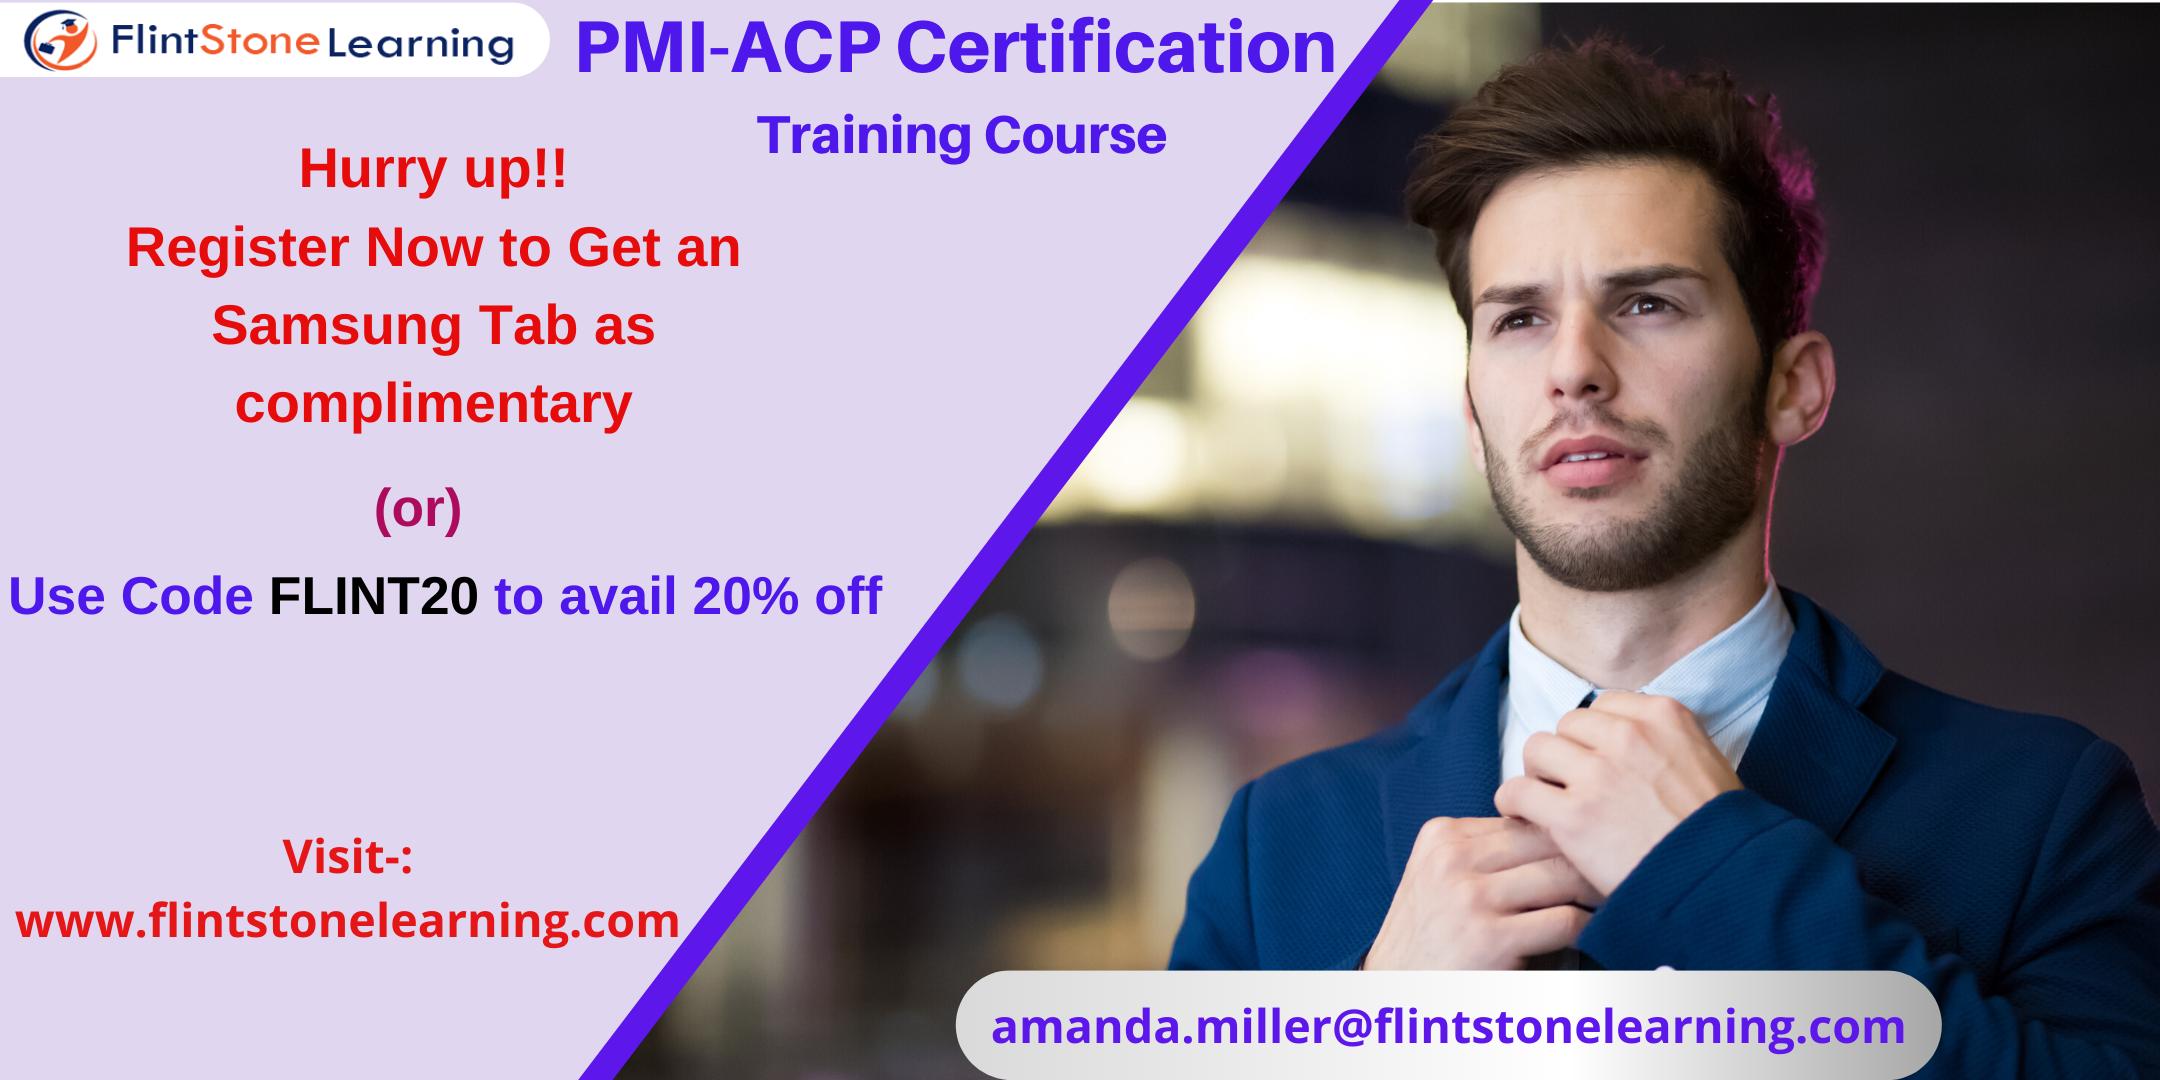 PMI-ACP Certification Training Course in Elizabeth, NJ